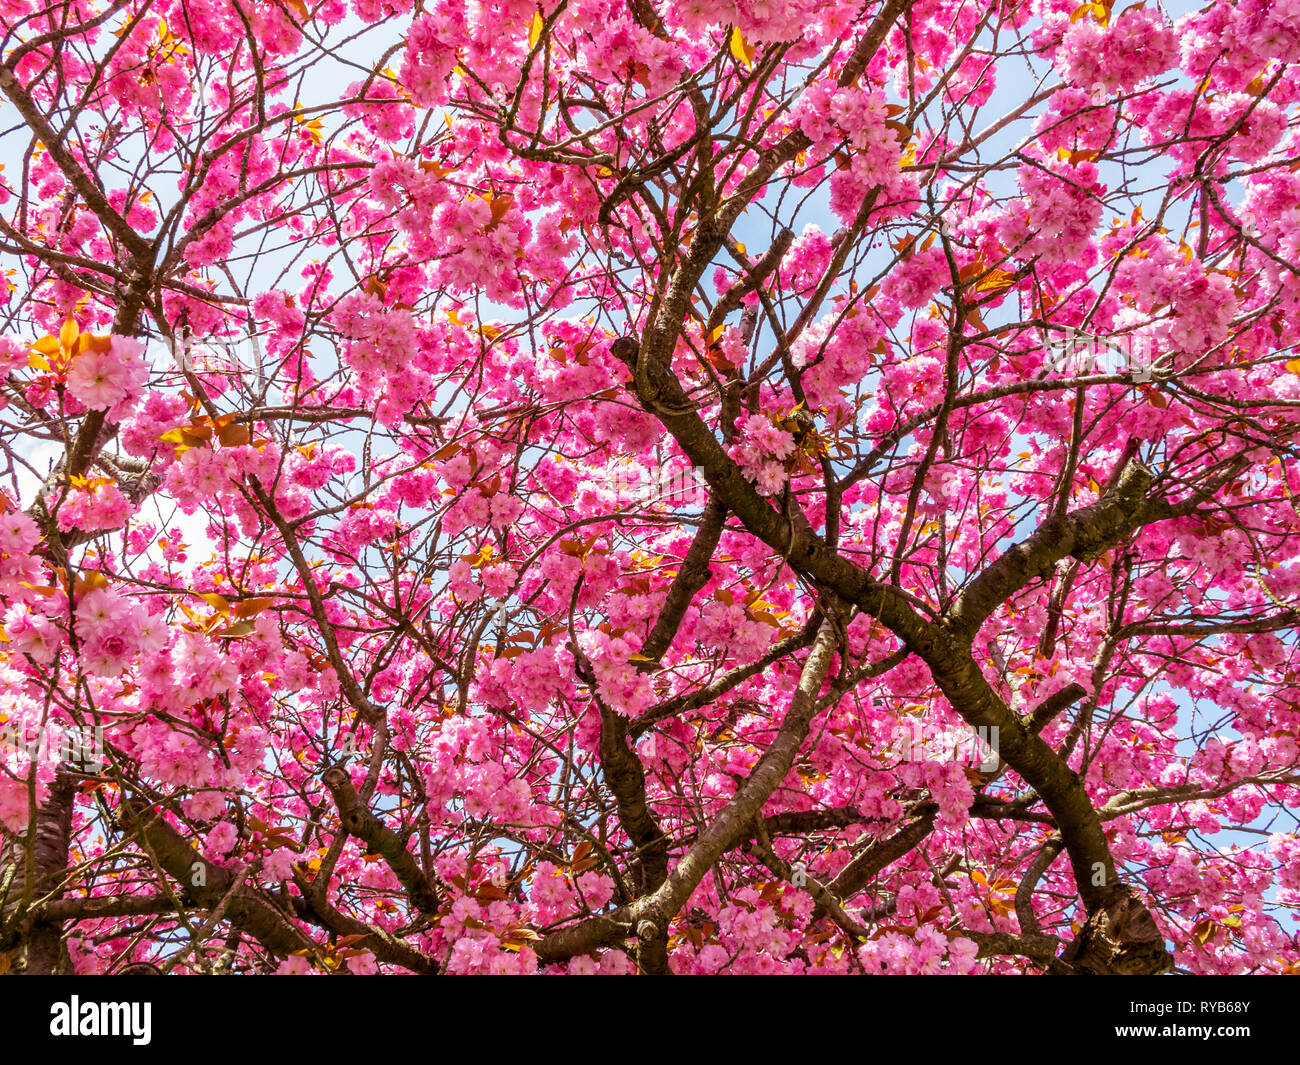 Beautiful Blooming May Cherry Blossom Tree In Front Of Saint John The Baptist Church In Rocherath Krinkelt Belgium Texture Background Stock Photo Alamy